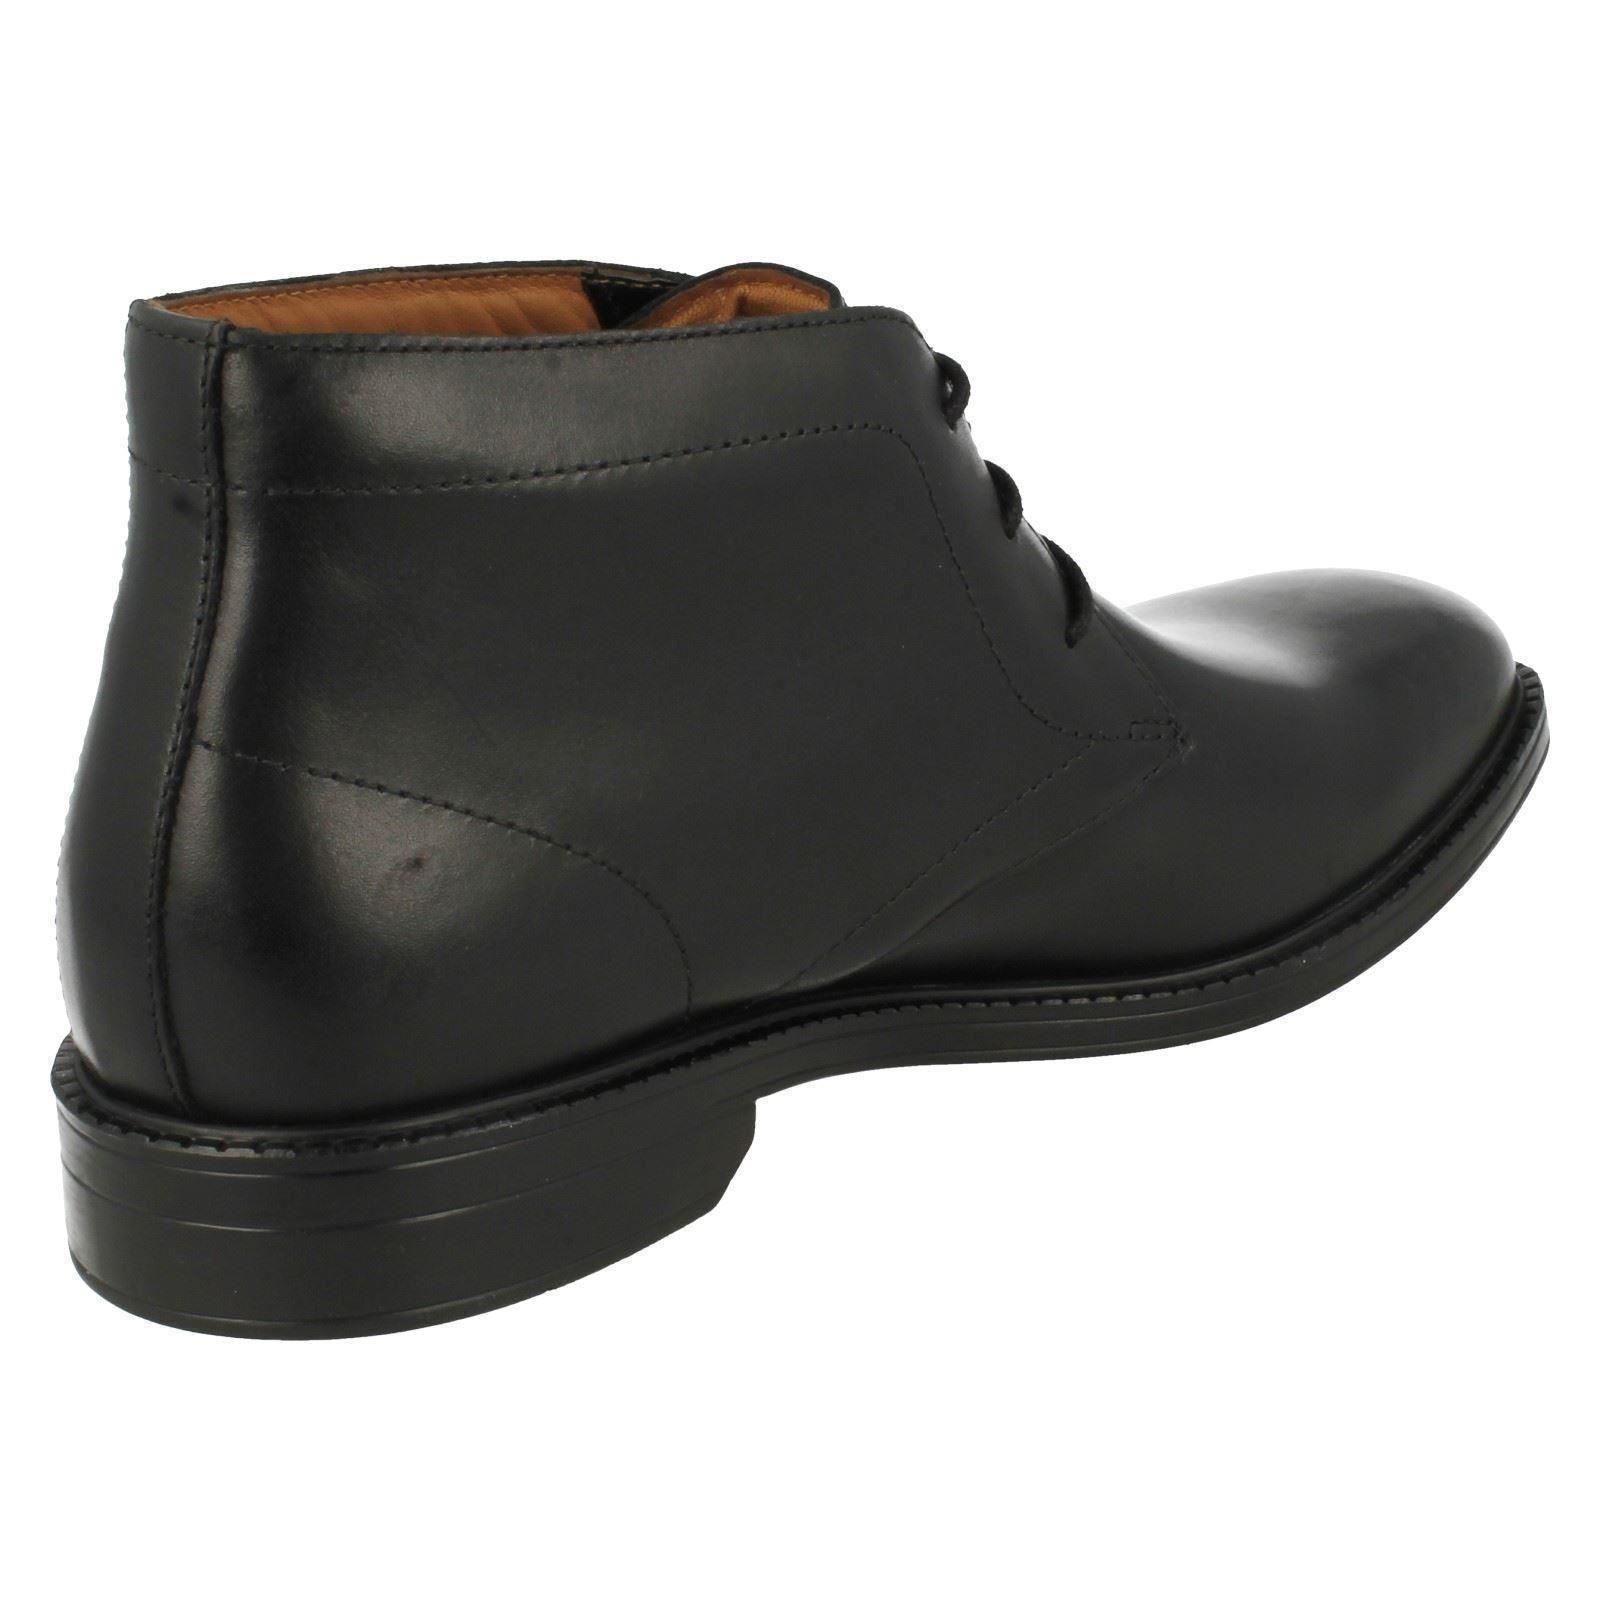 Gentleman/Lady All Saints Mens Boots Size 8 superior International workmanship choice Excellent workmanship International 7b3e73